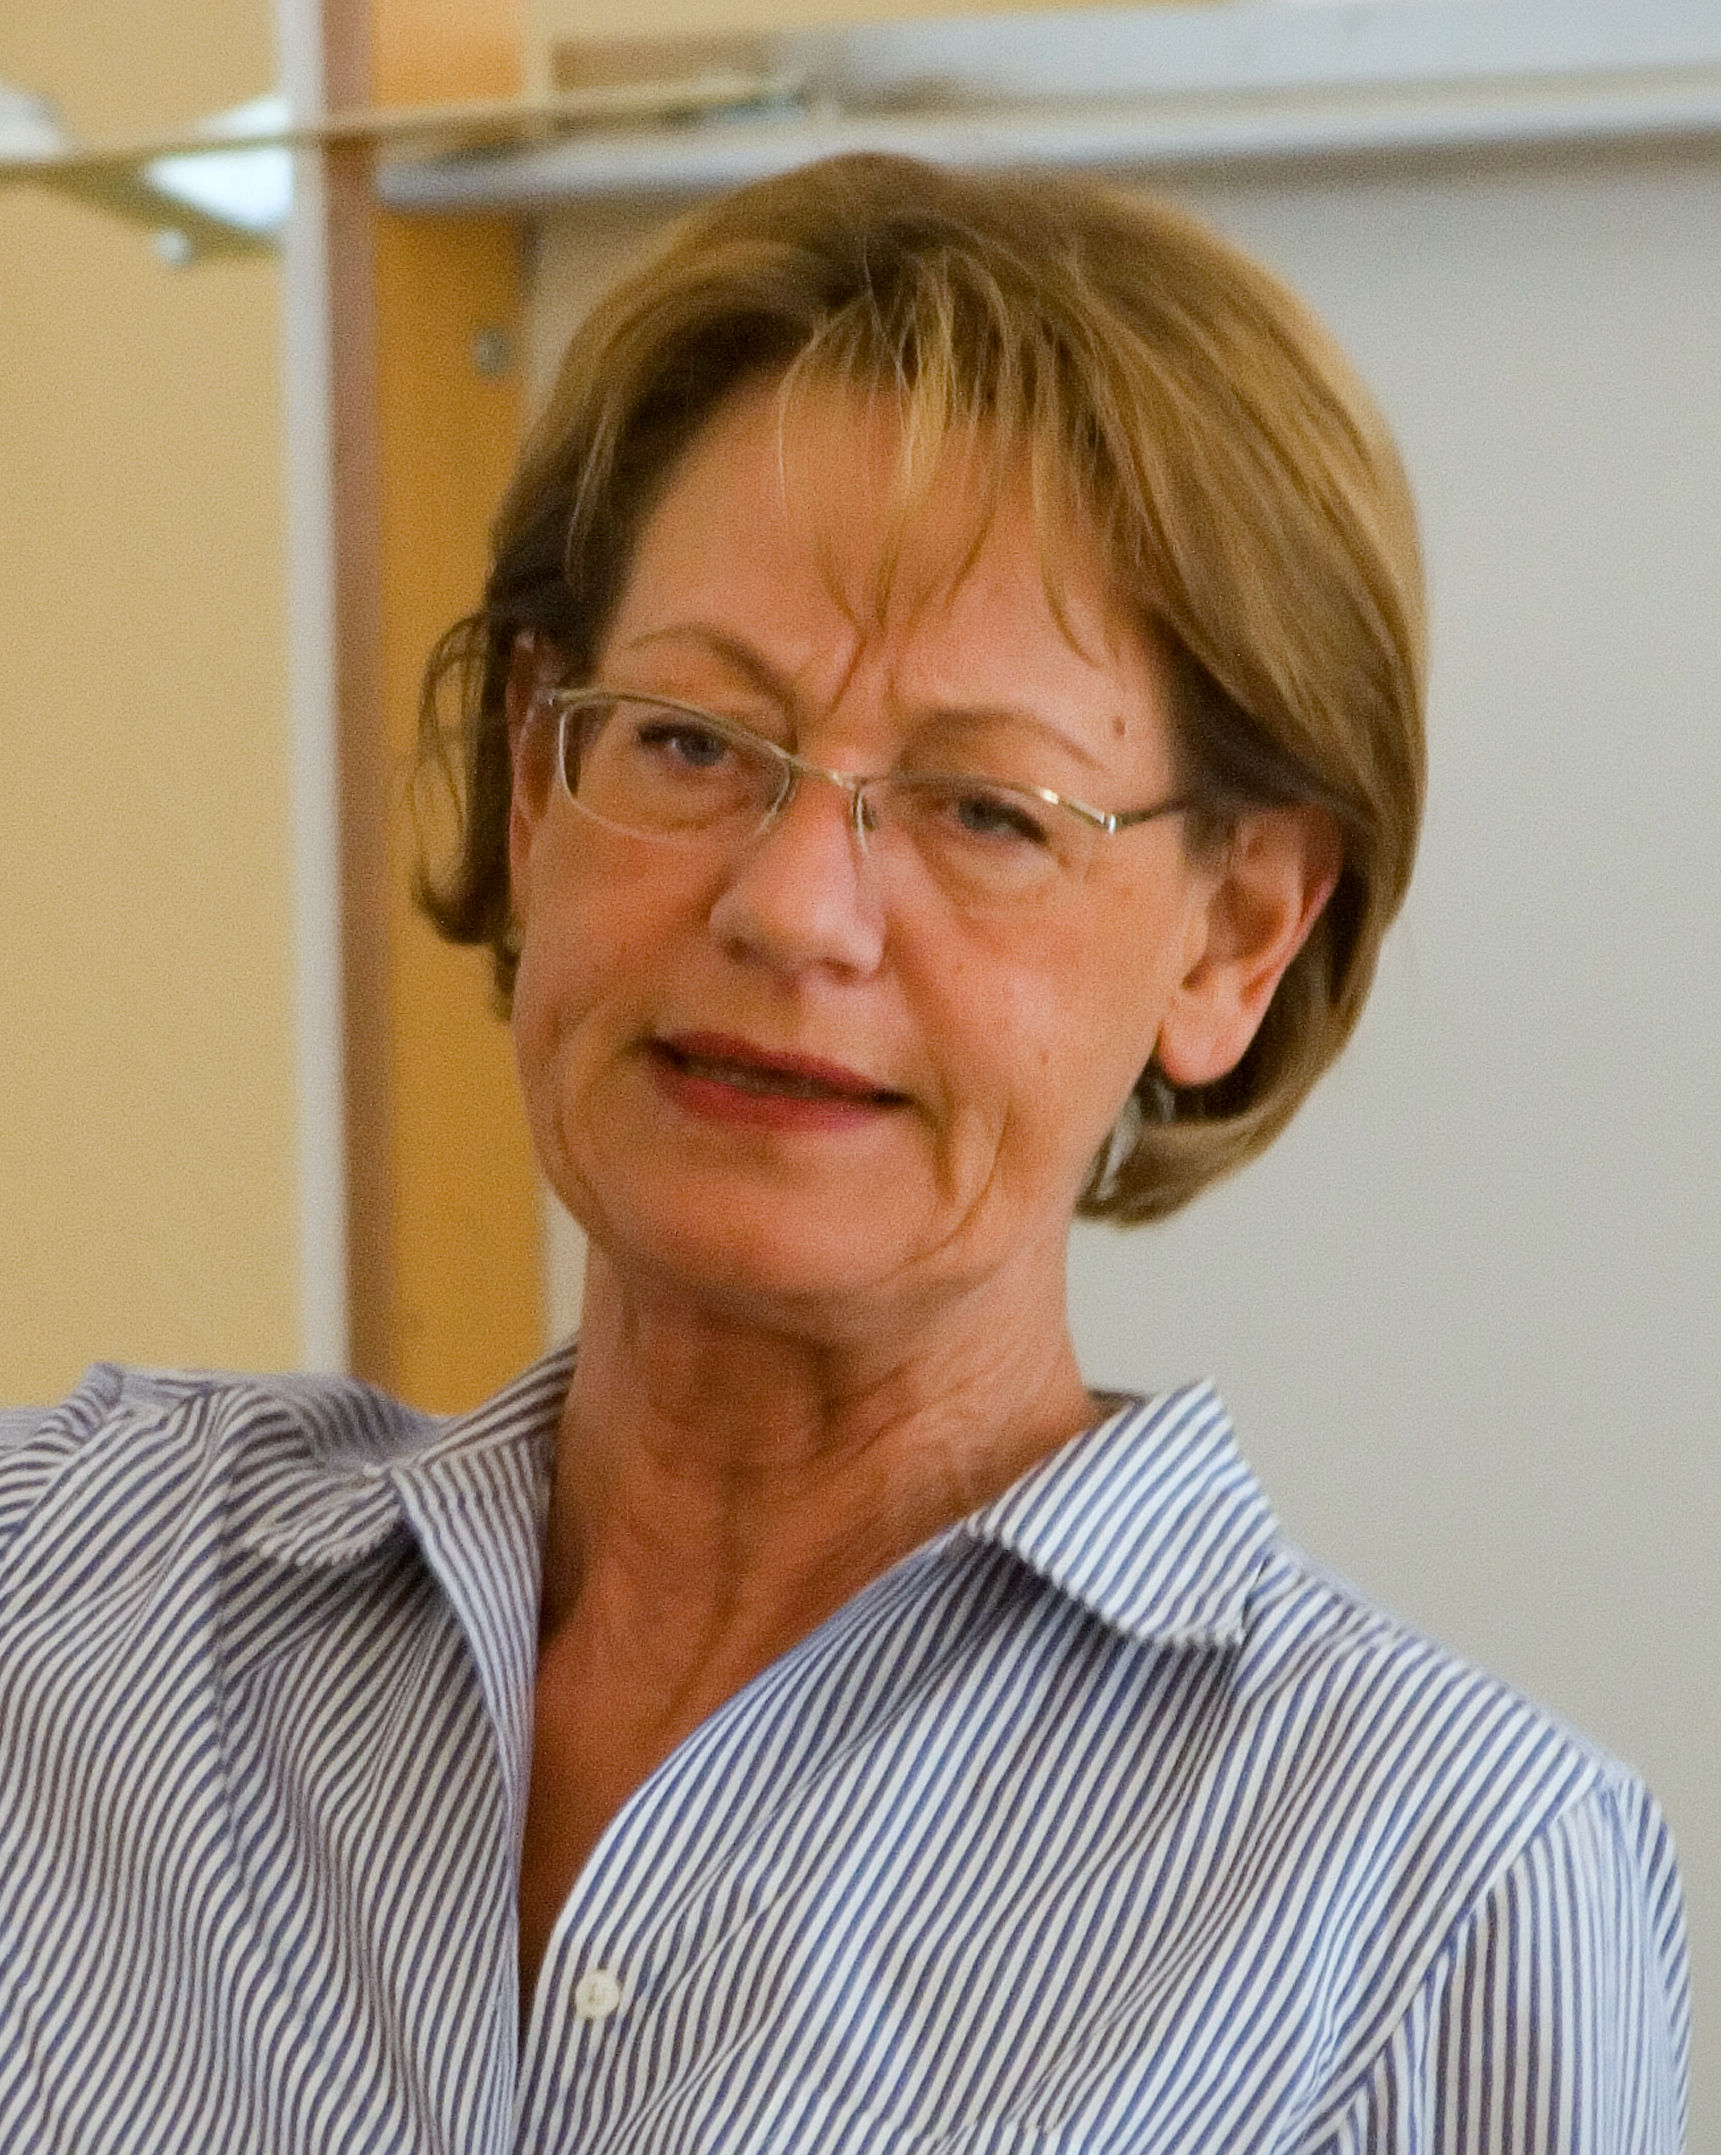 Photo of Gudrun Schyman: Swedish politician and feminist